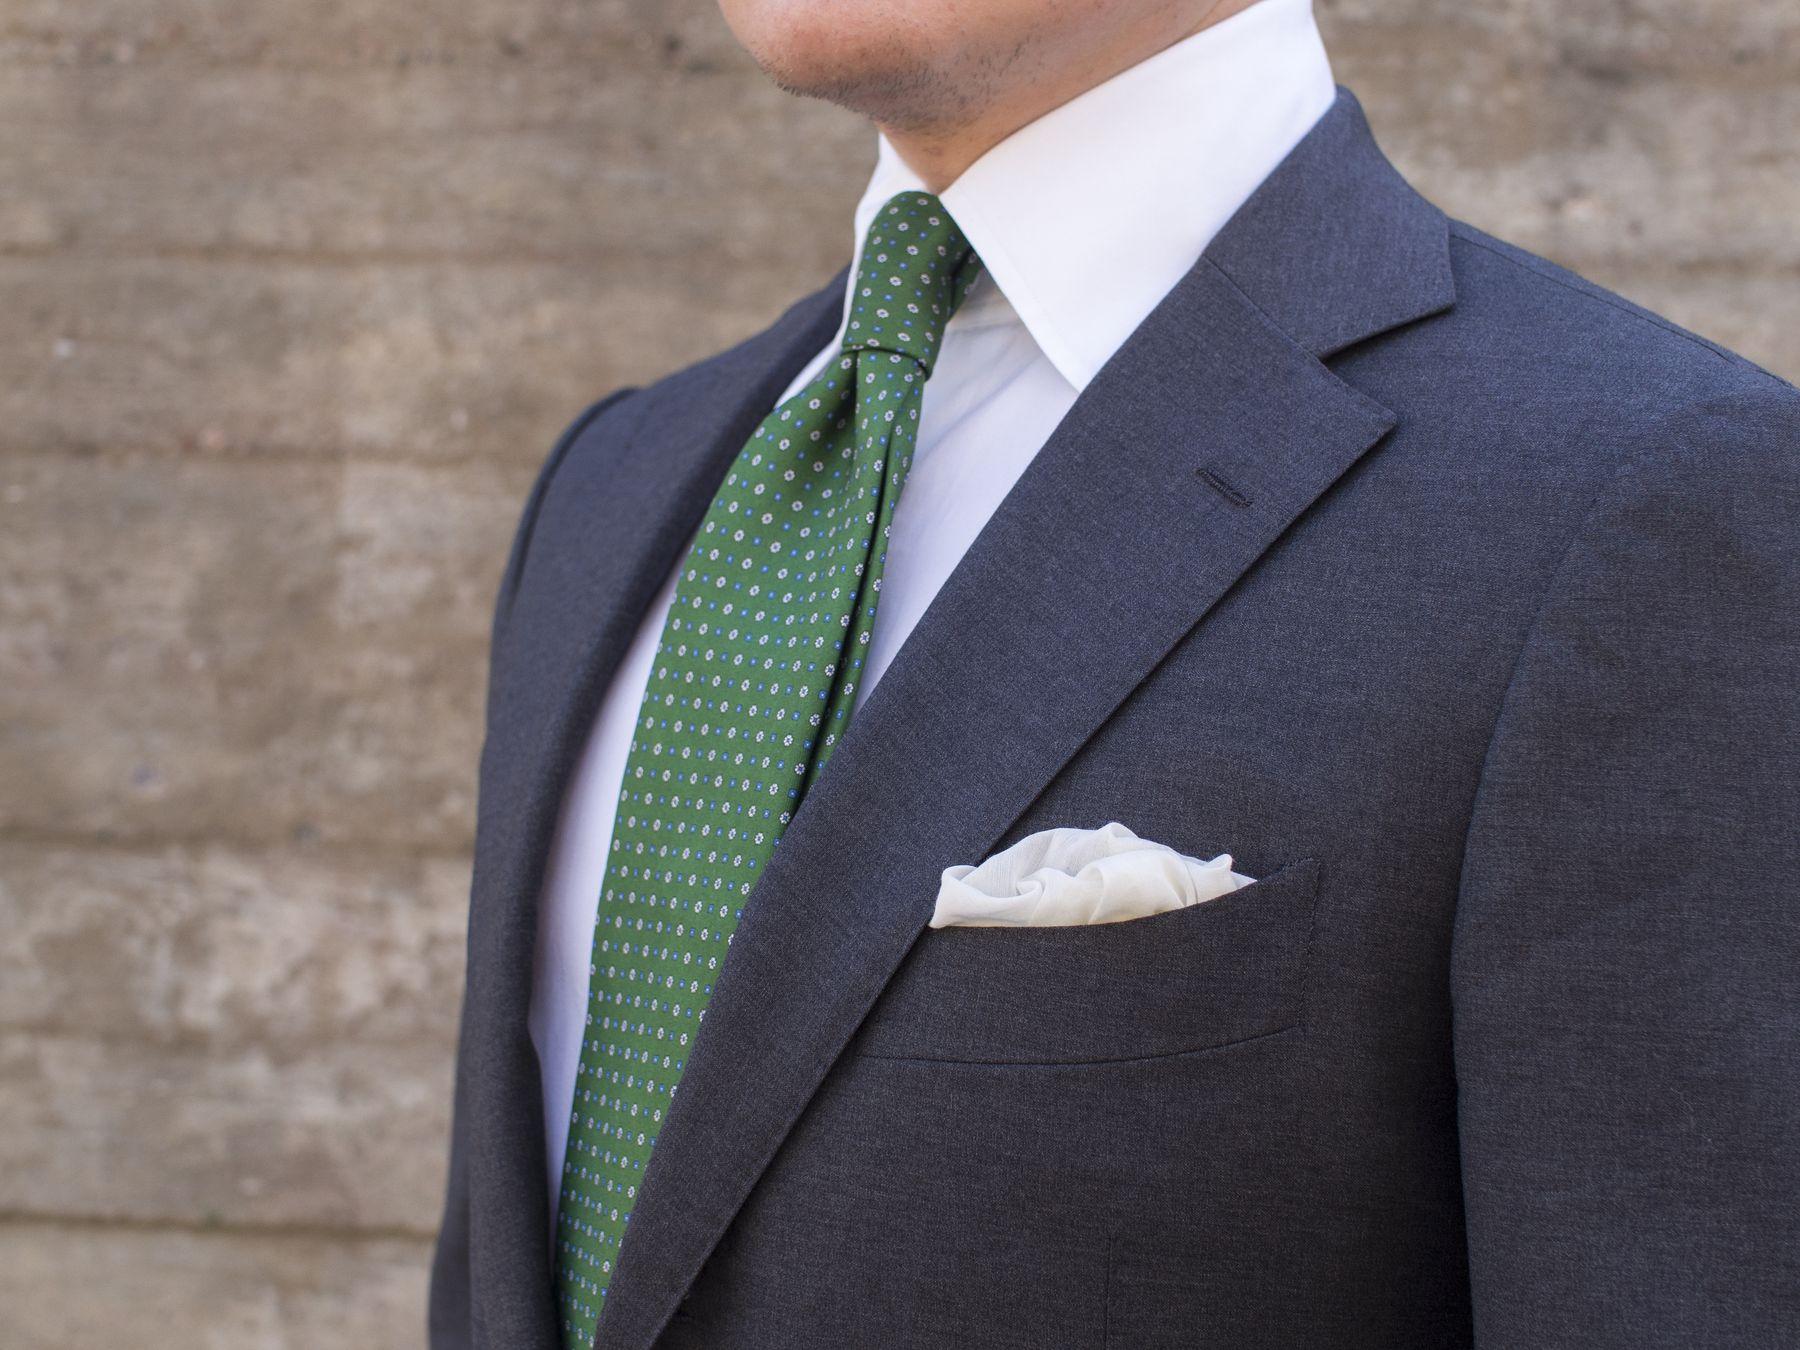 Oxford Shirt Suitsupply - Nils Stucki Kieferorthopäde